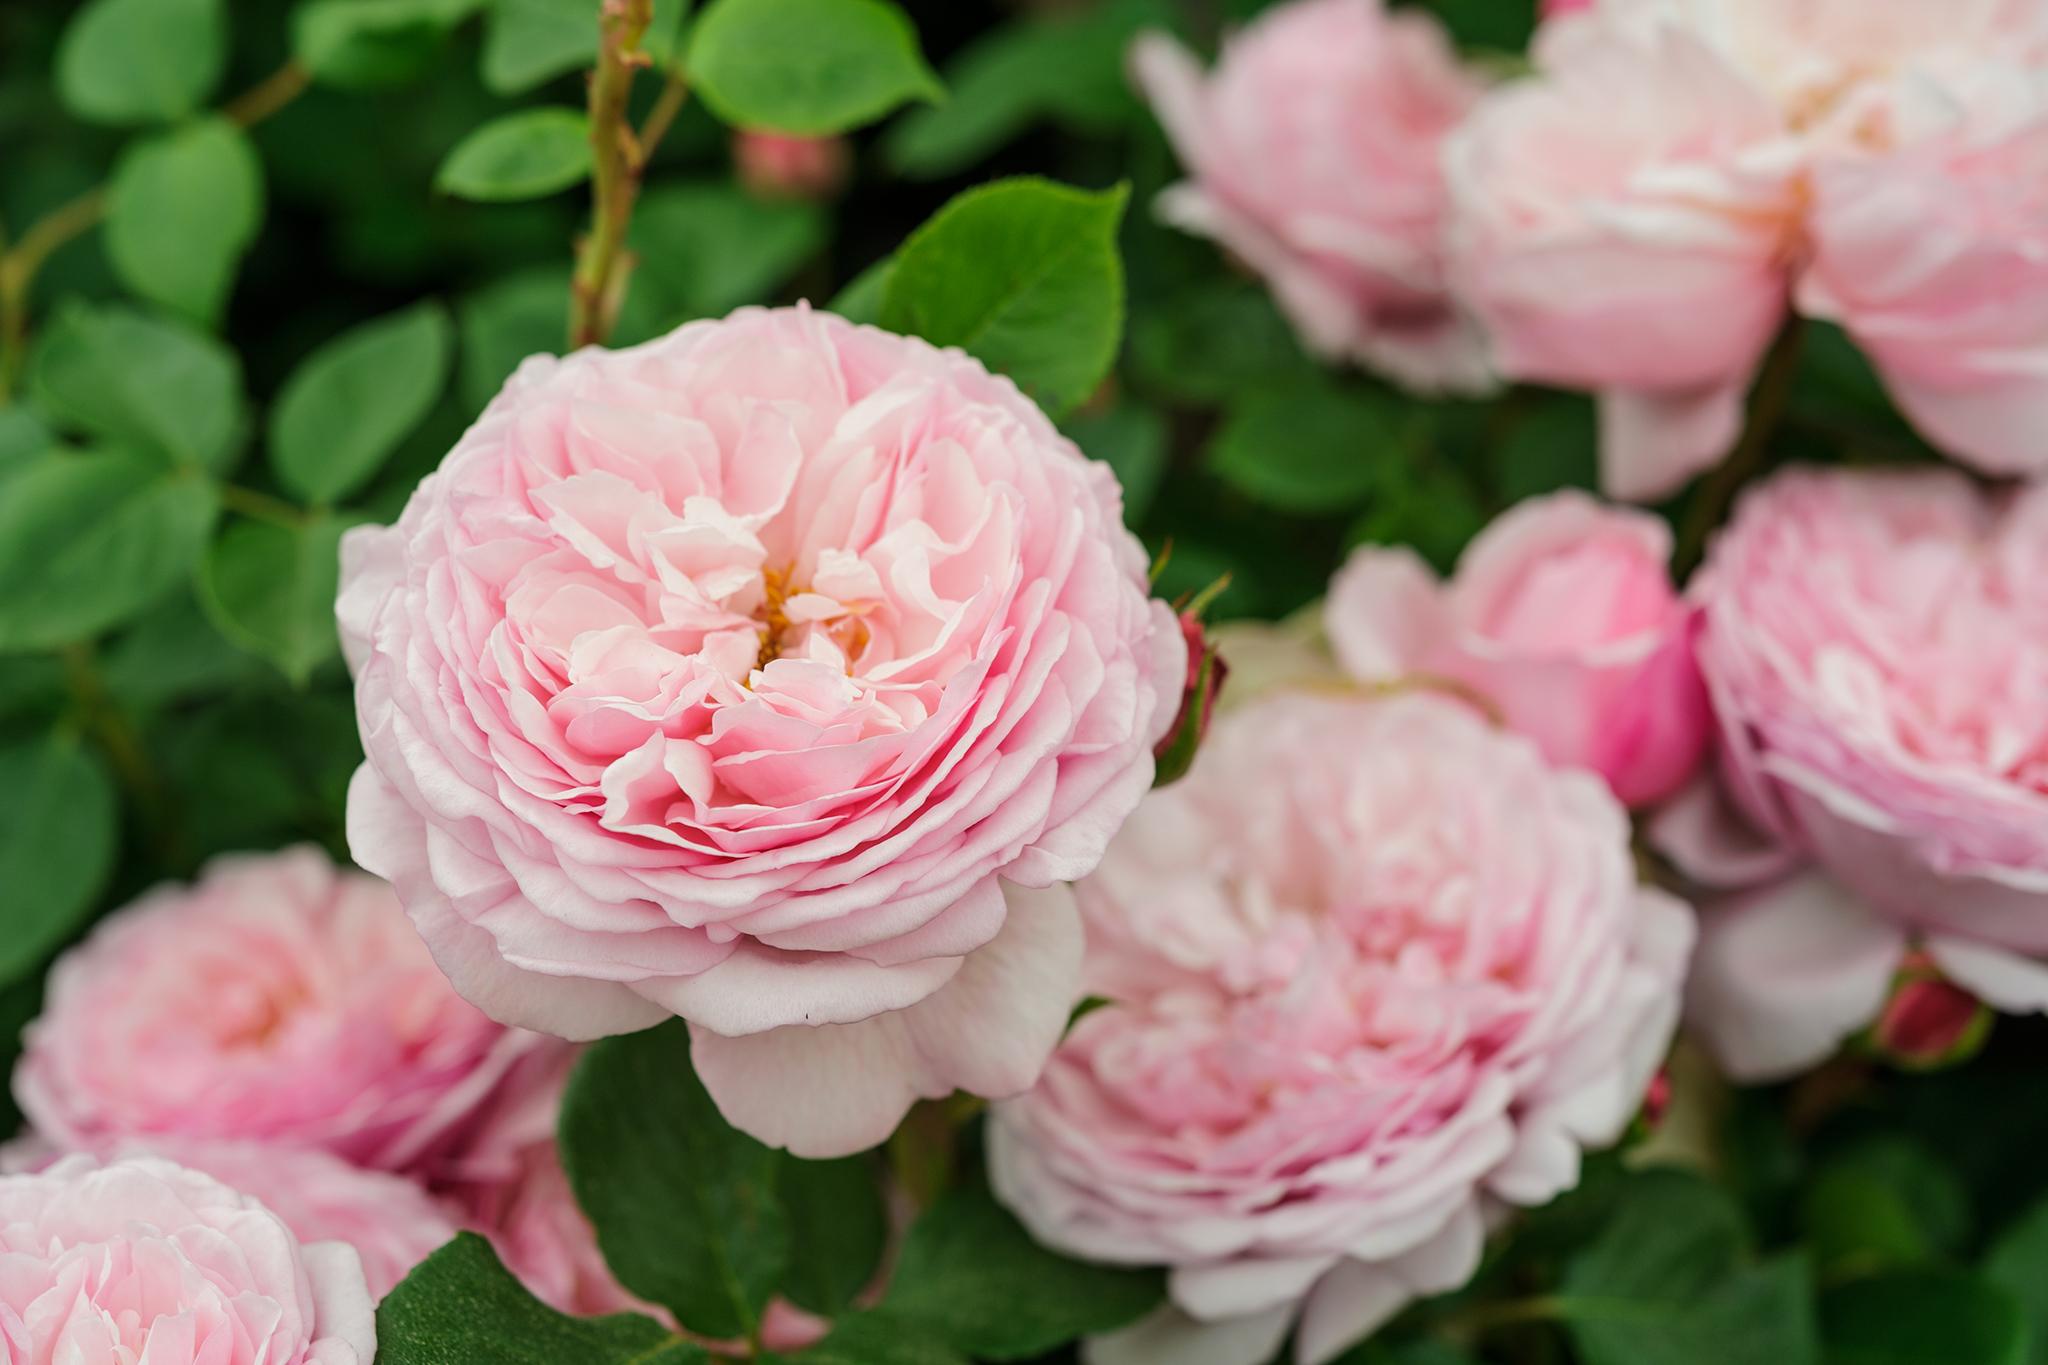 Rosa St Ethelburga